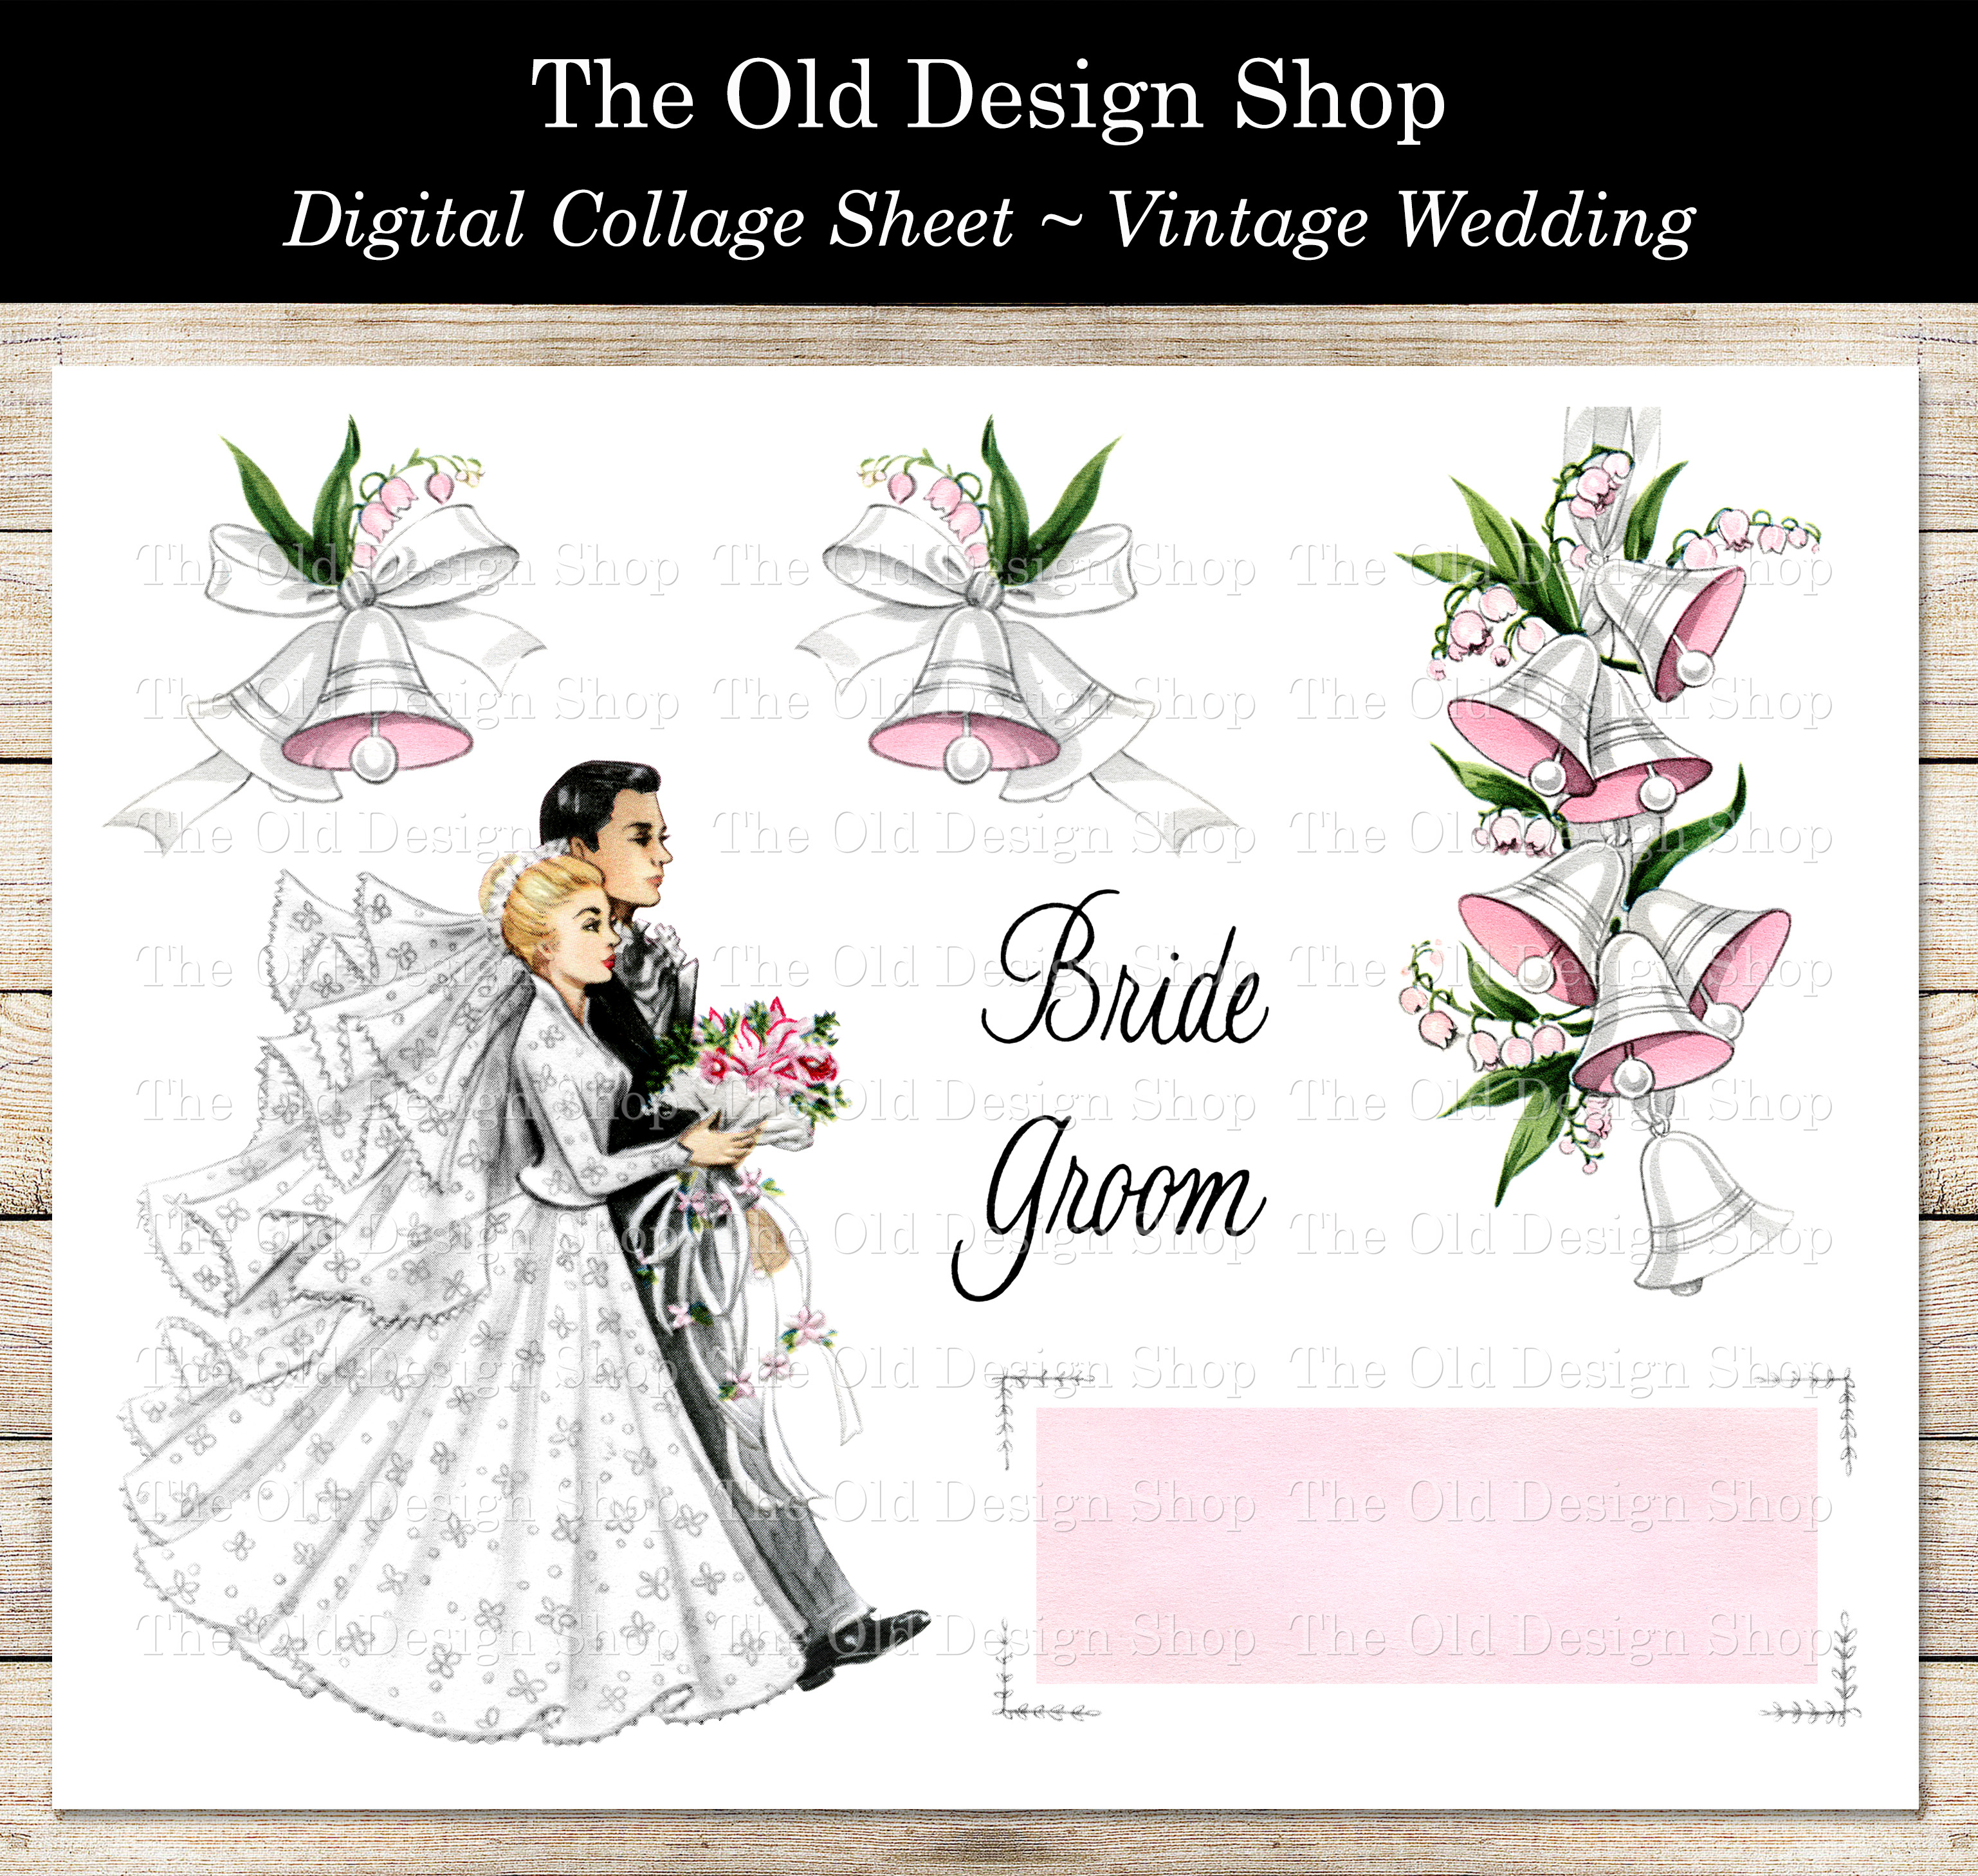 vintage wedding digital collage sheet